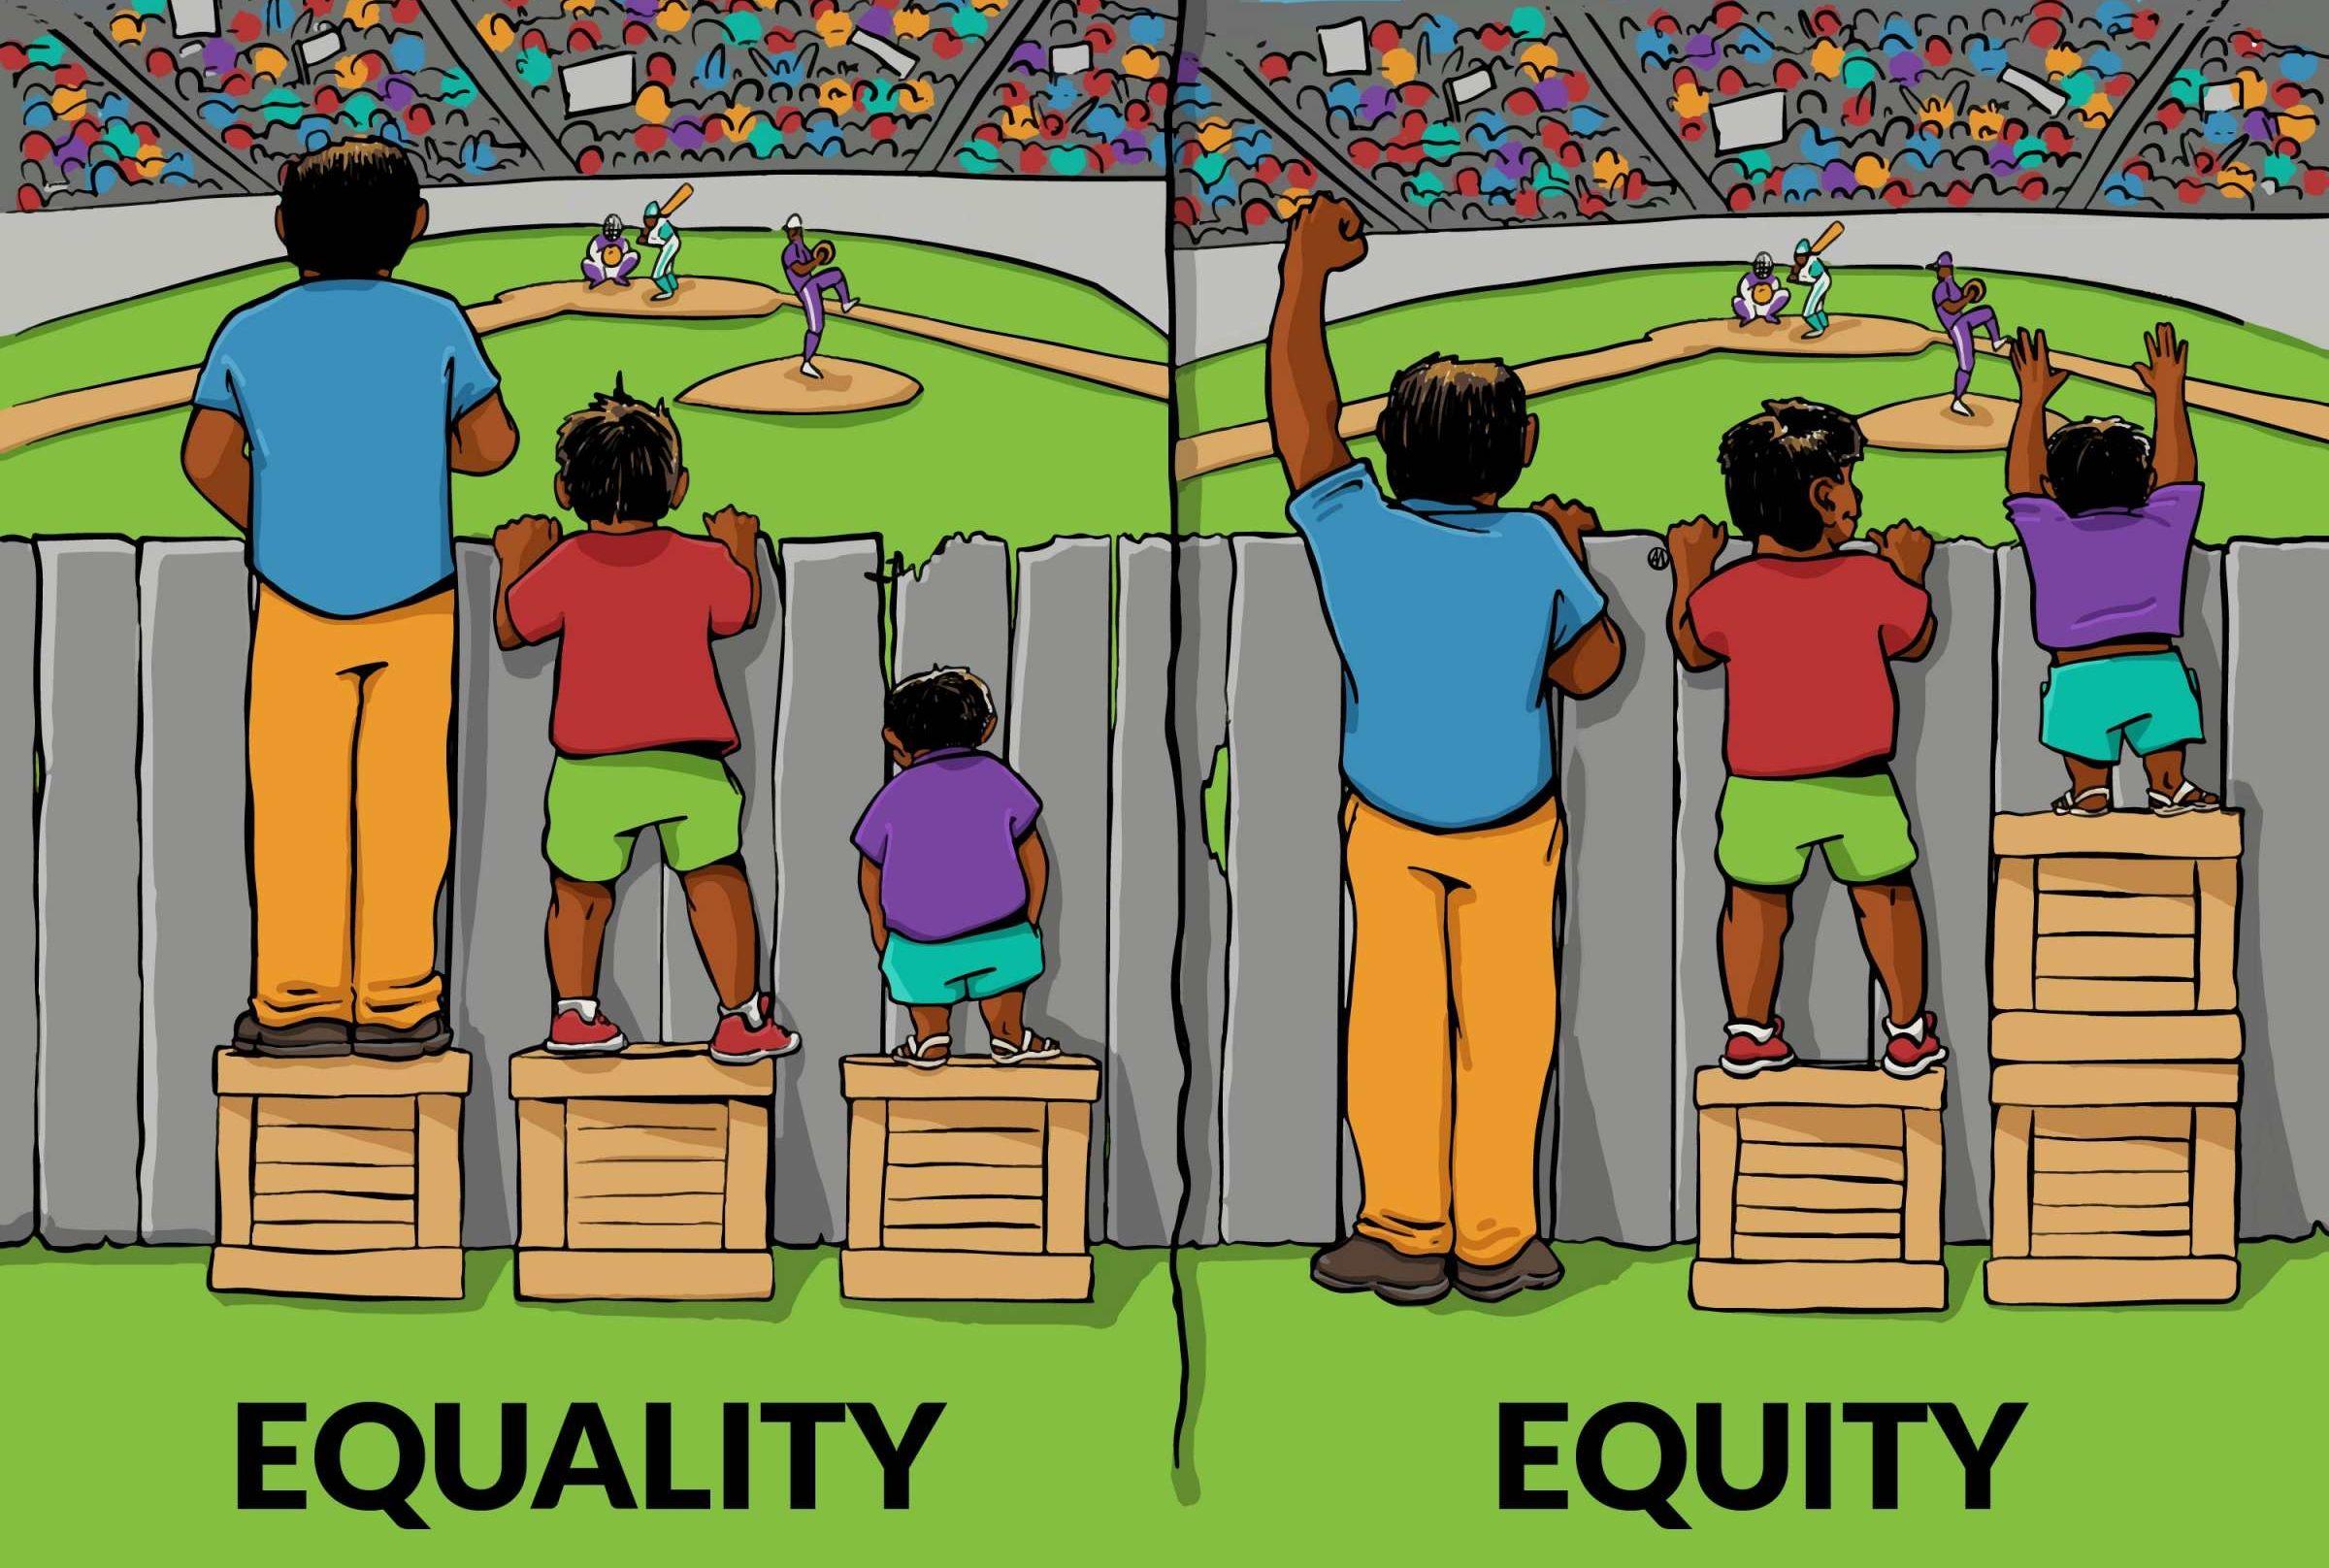 https://images2.minutemediacdn.com/image/upload/c_crop,h_1616,w_2400,x_0,y_132/v1591824036/shape/mentalfloss/625404-iisc_equalityequity_300ppi.jpg?itok=mdurY8vk